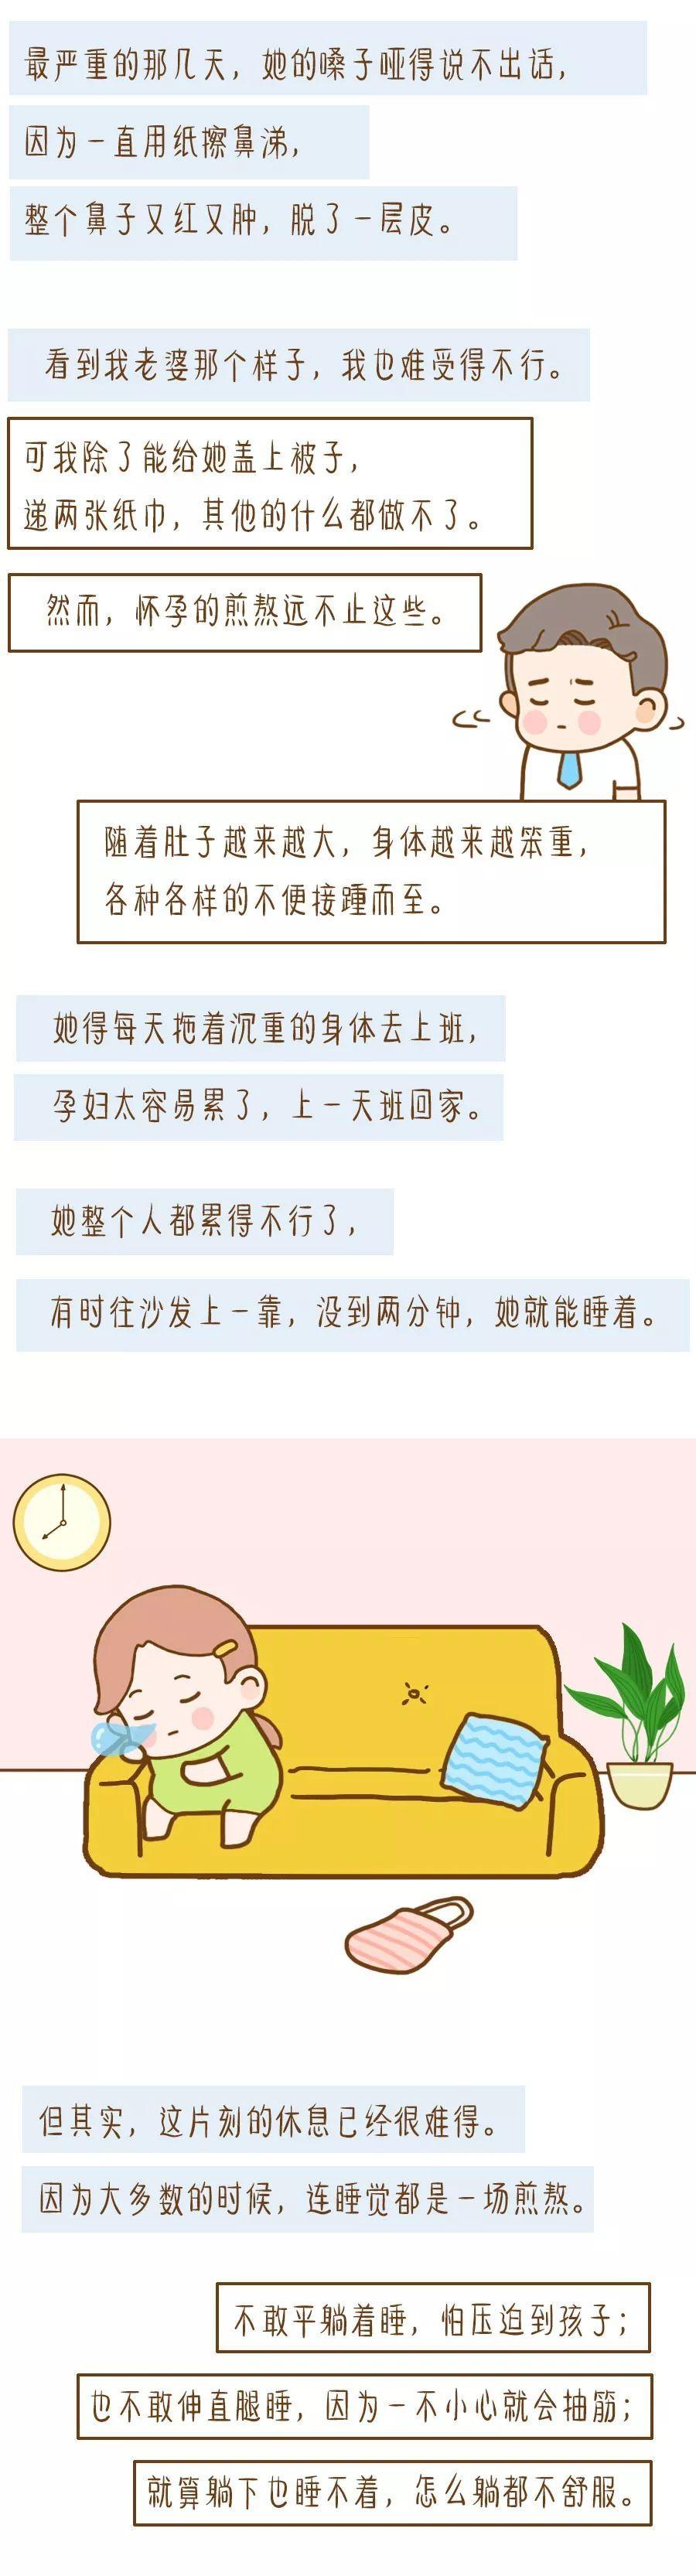 wellbet官方网站登录 4